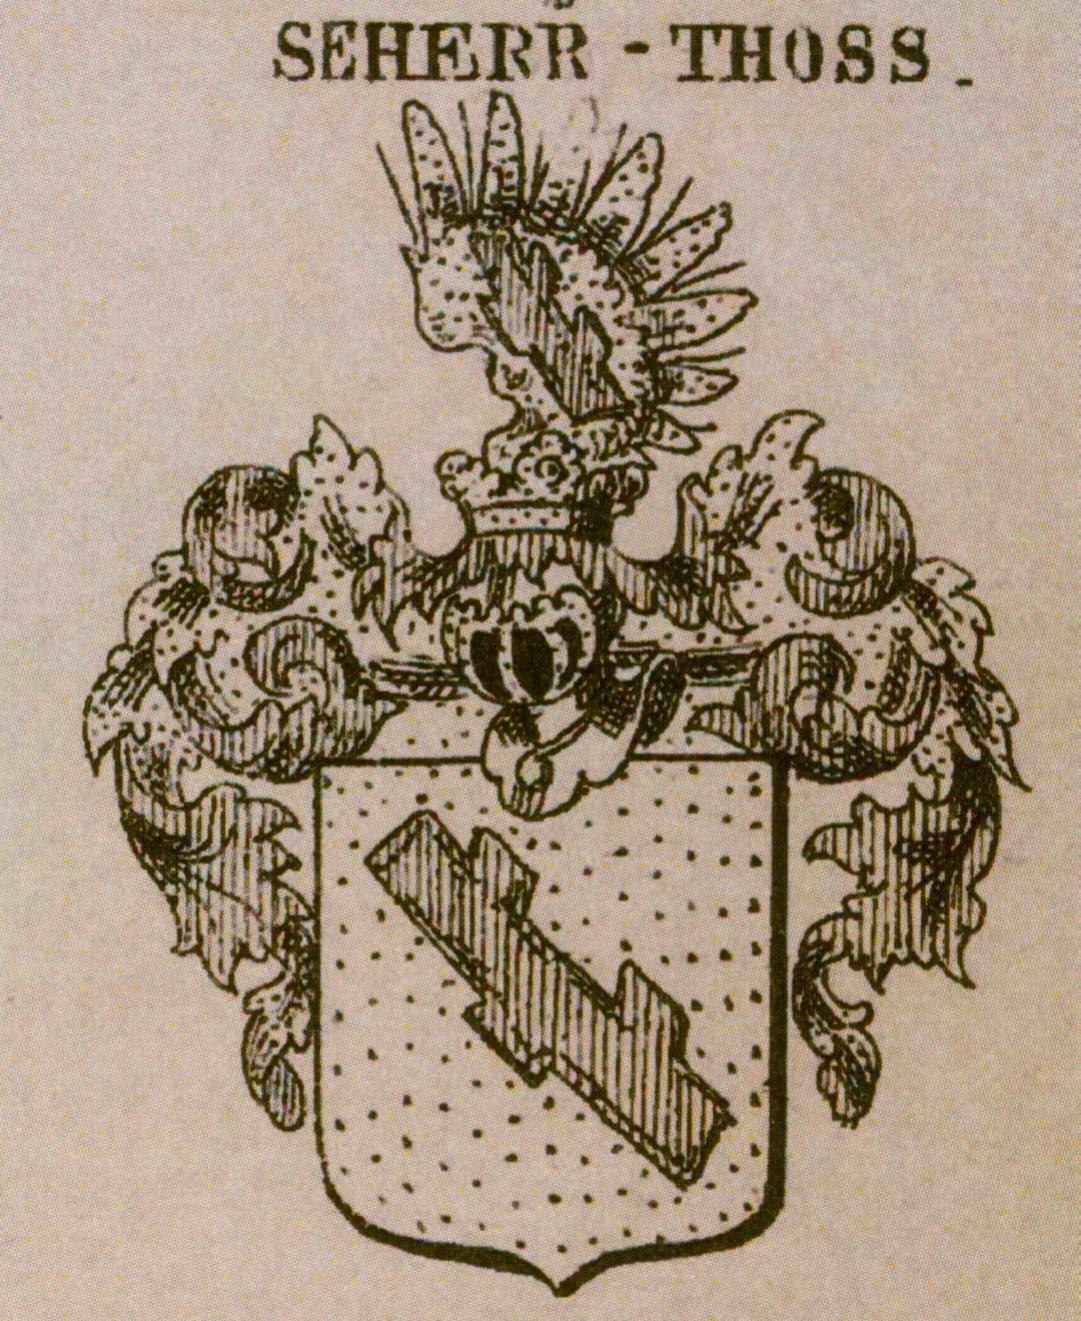 Seherr-Thoss